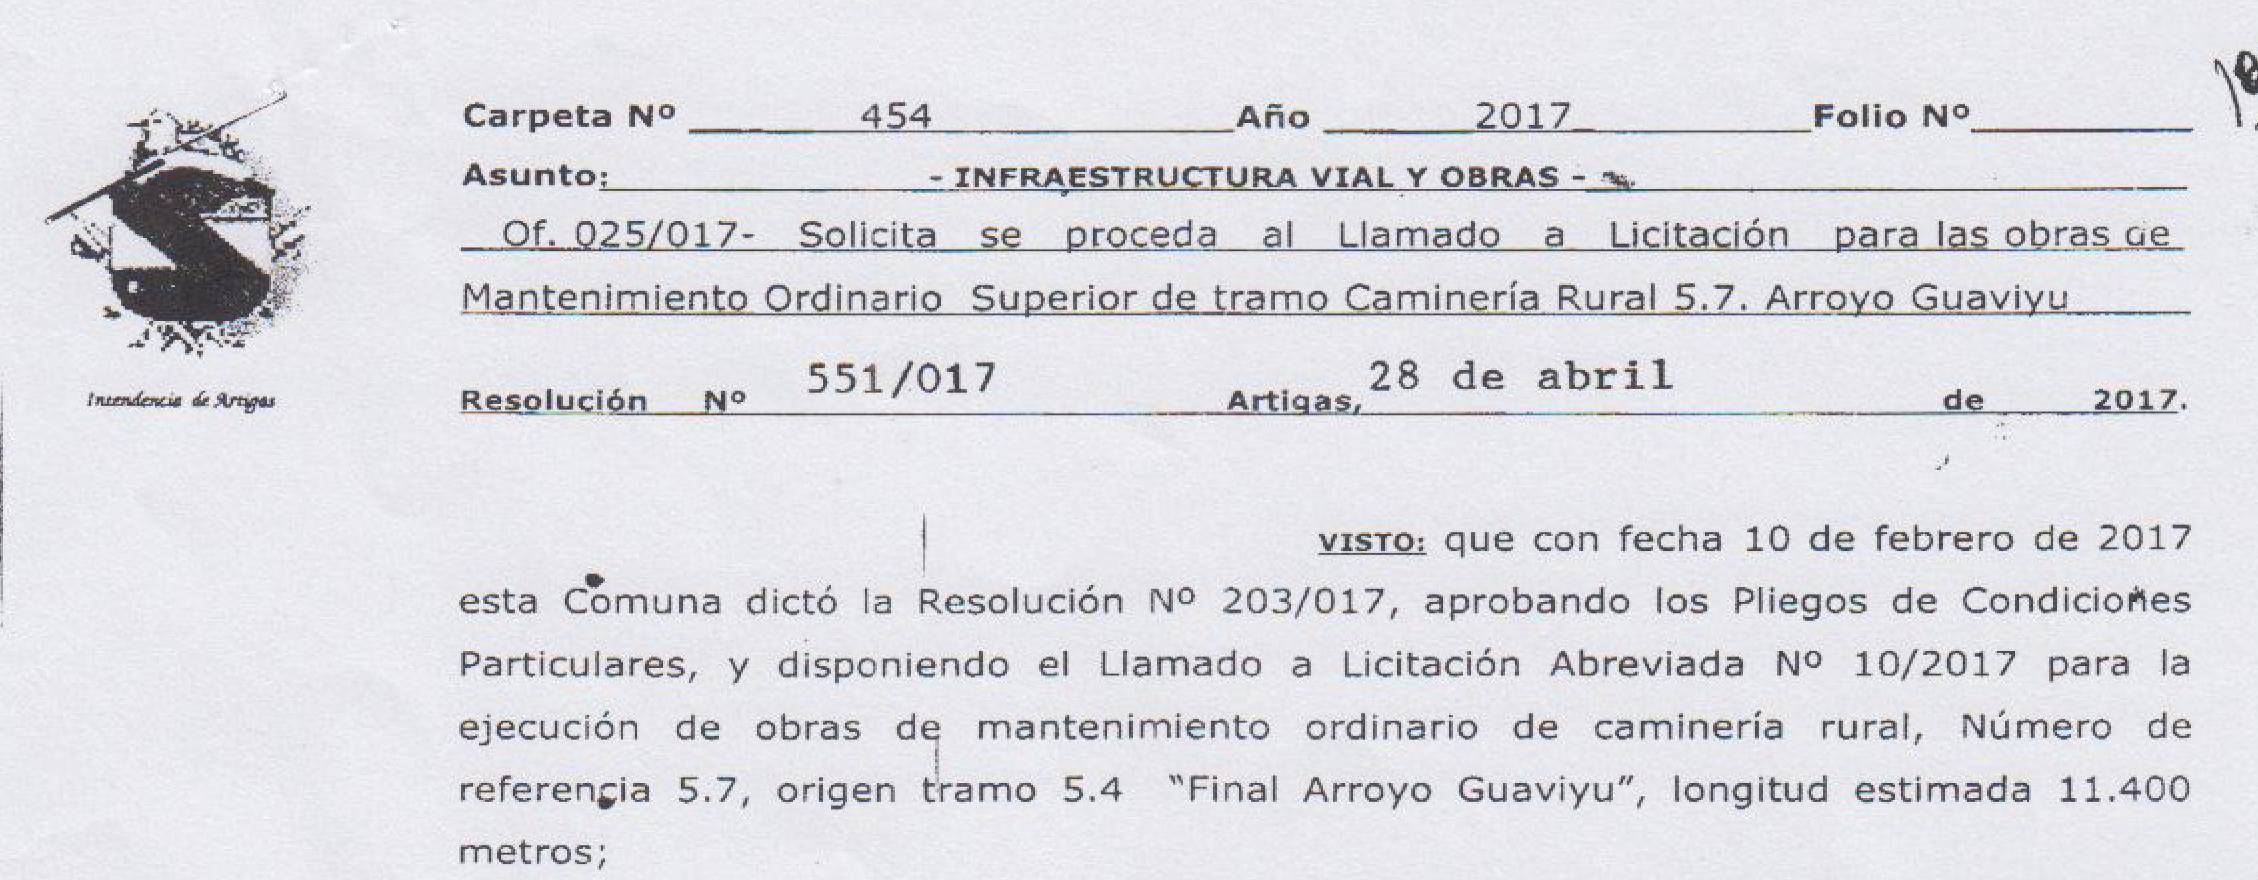 resolucion-551-017-1